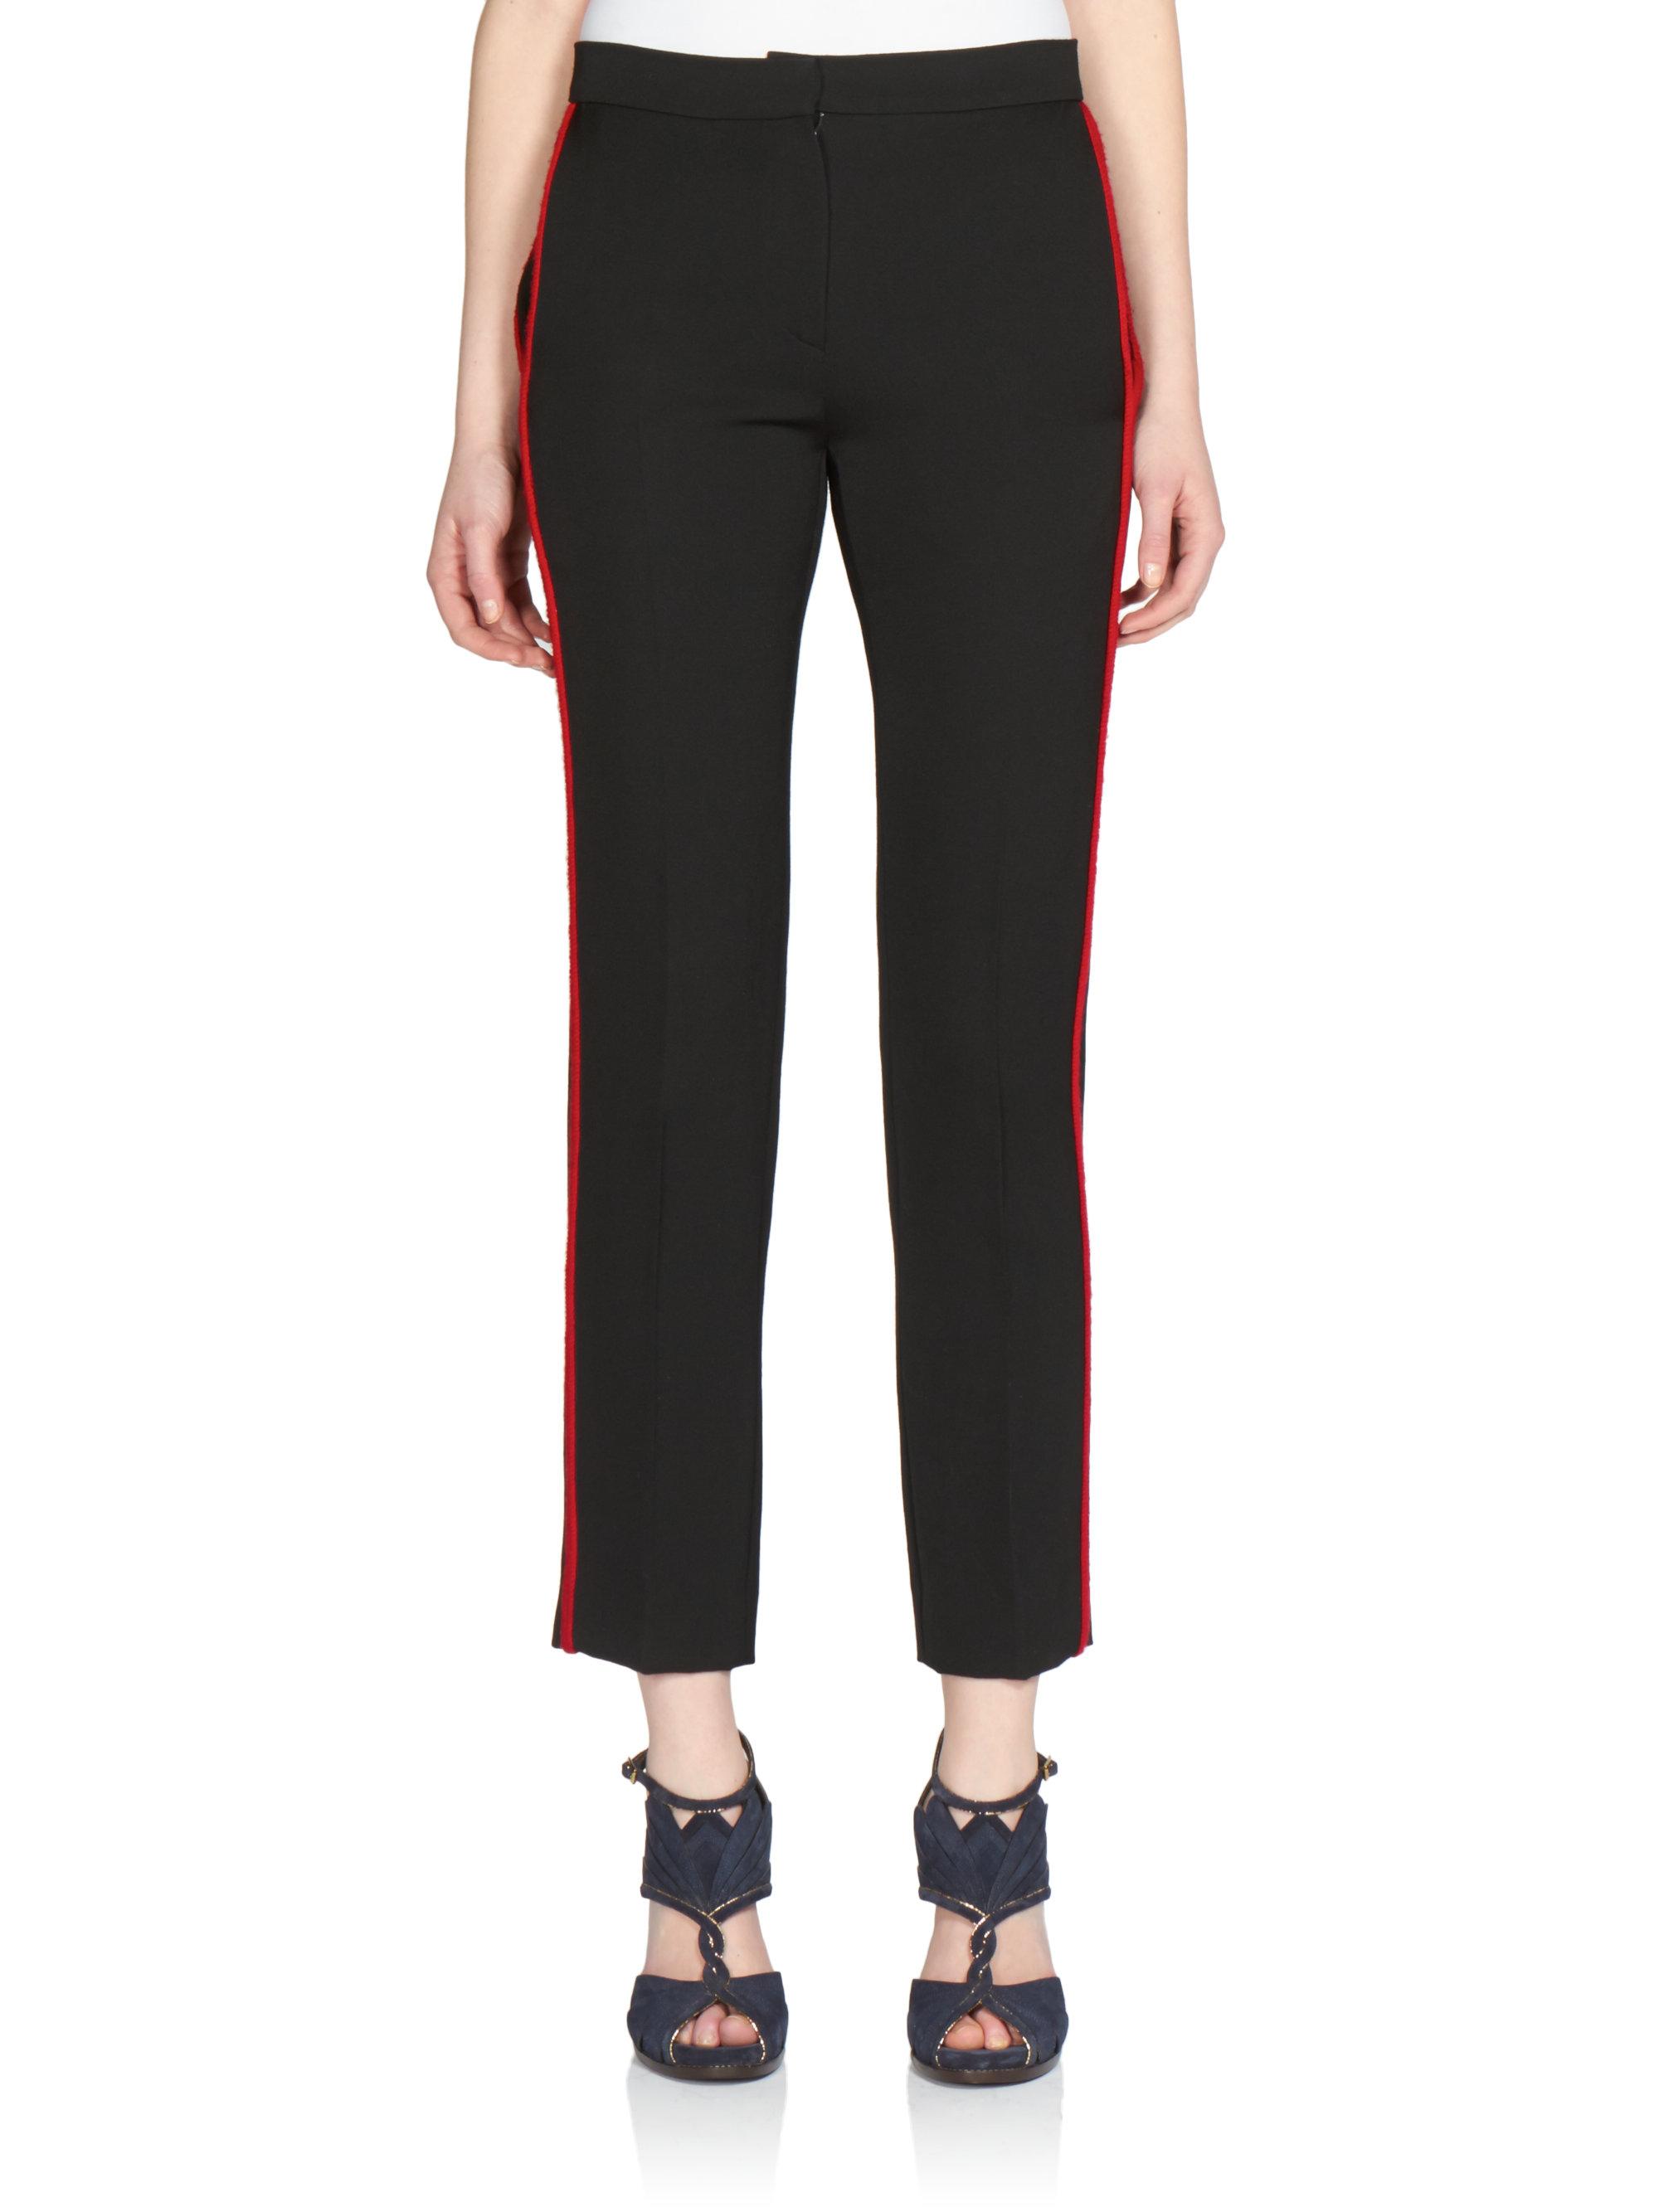 Creative Basic Essentials  Women Lime Green Black Tuxedo Skinny Jean Pants